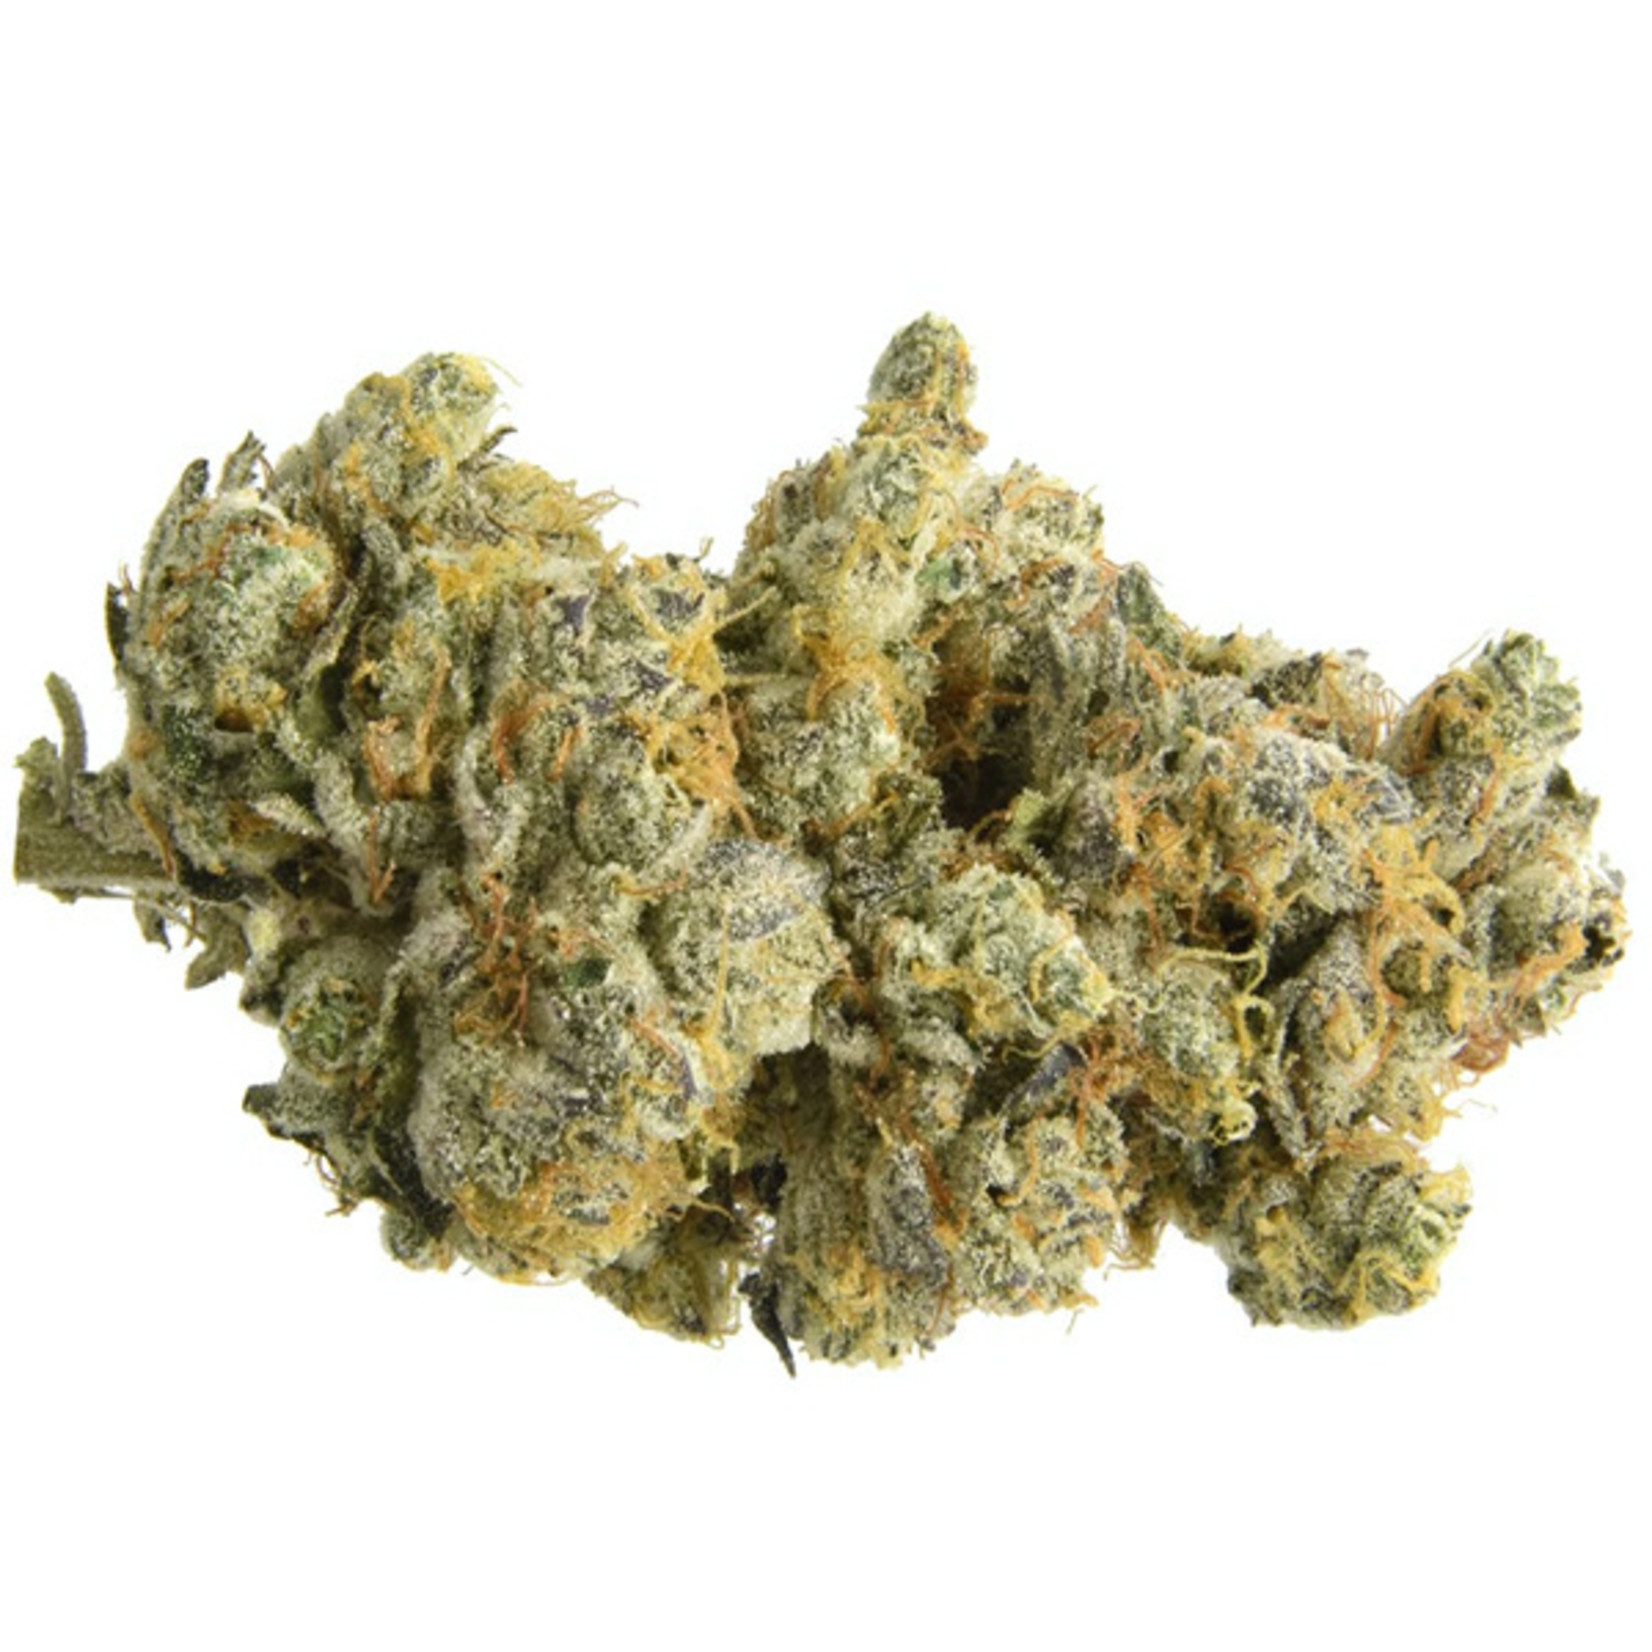 Auto GMO Cookies cannabis seeds